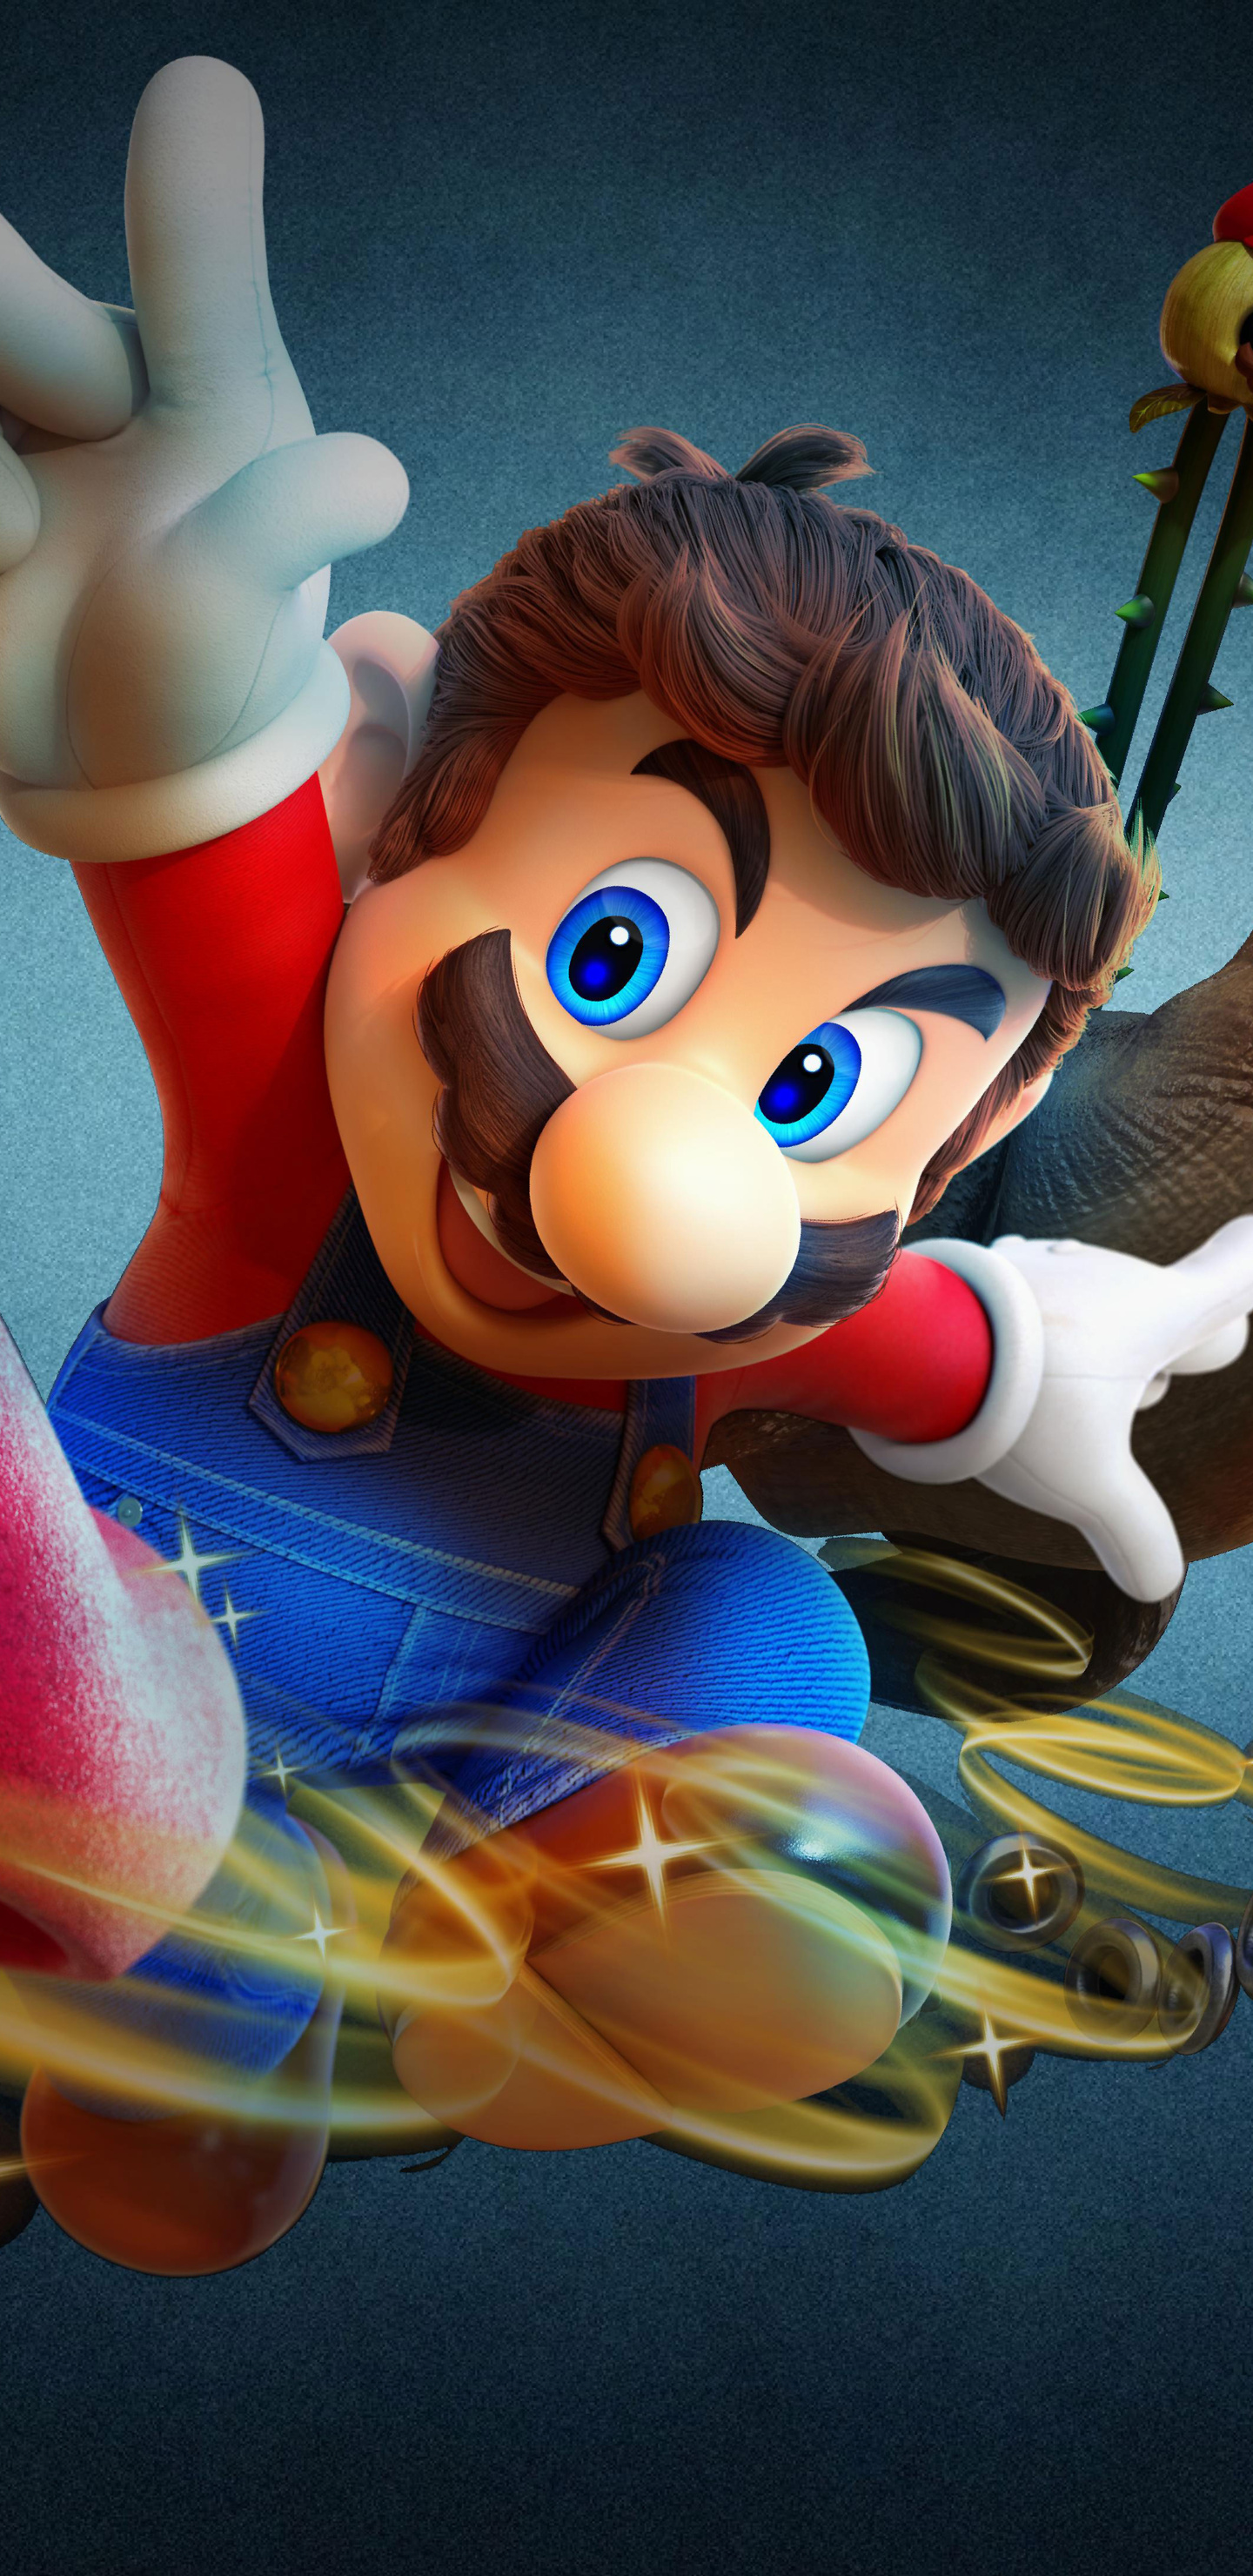 1440x2960 Super Mario Odyssey 8k Samsung Galaxy Note 9 8 S9 S8 S8